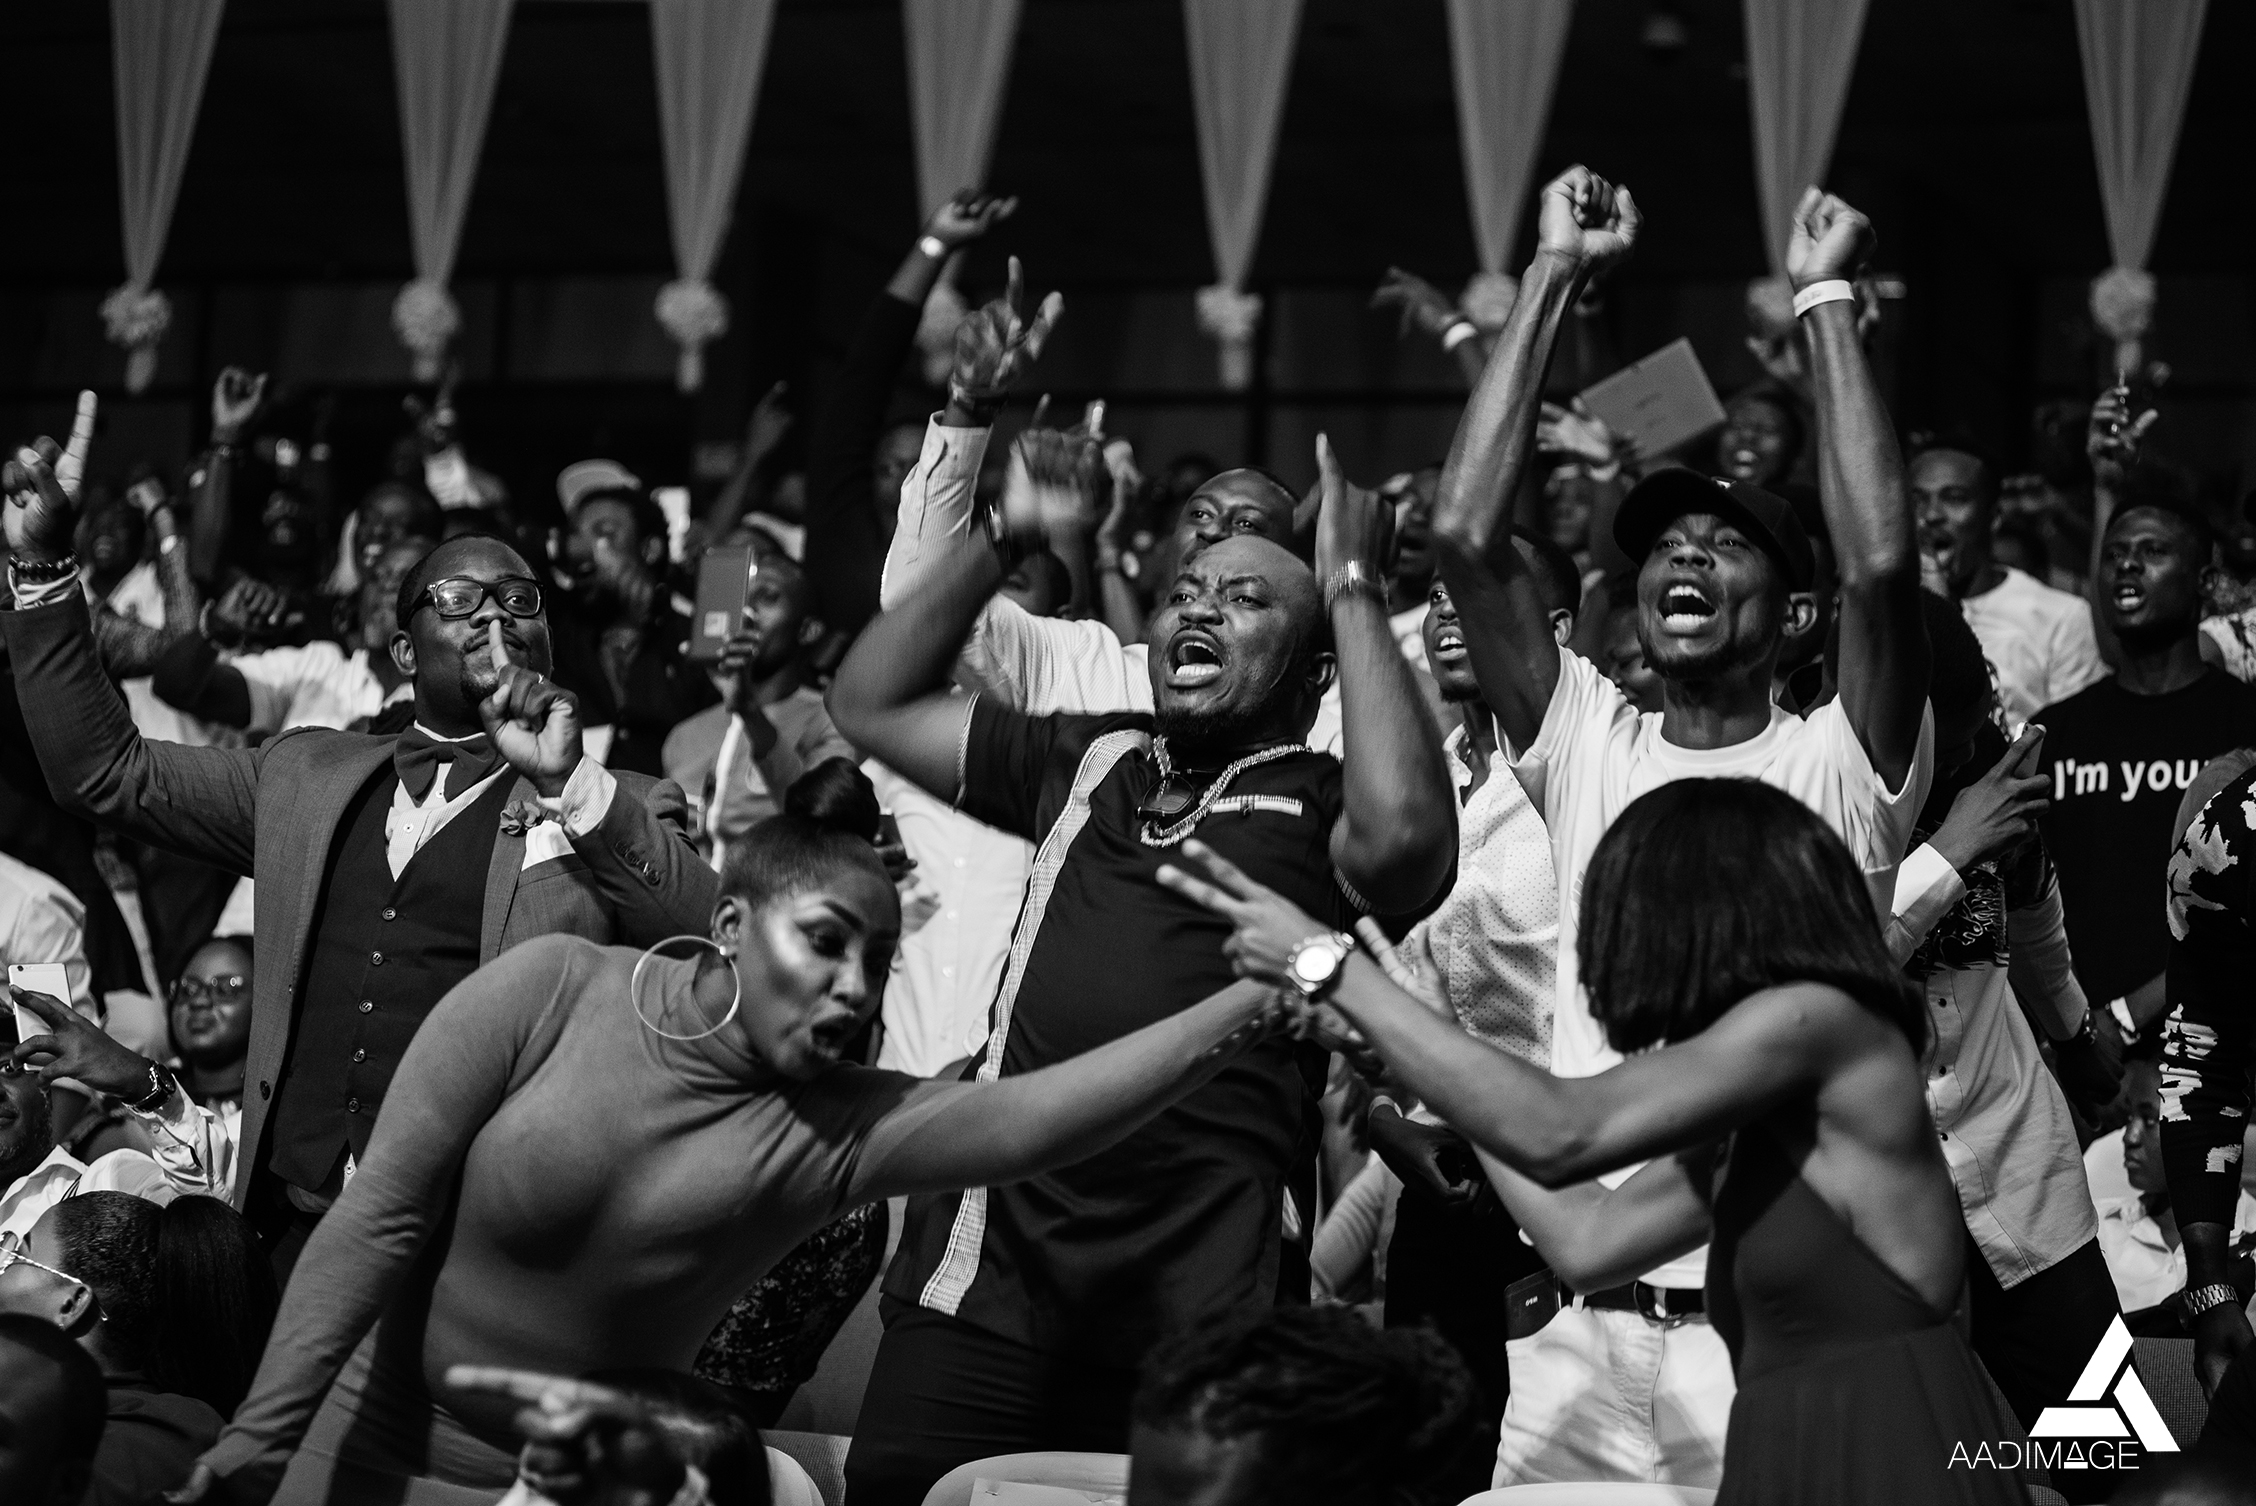 Kwaw Kese Wows Audience With DJ Skills at 2018 Ghana DJ